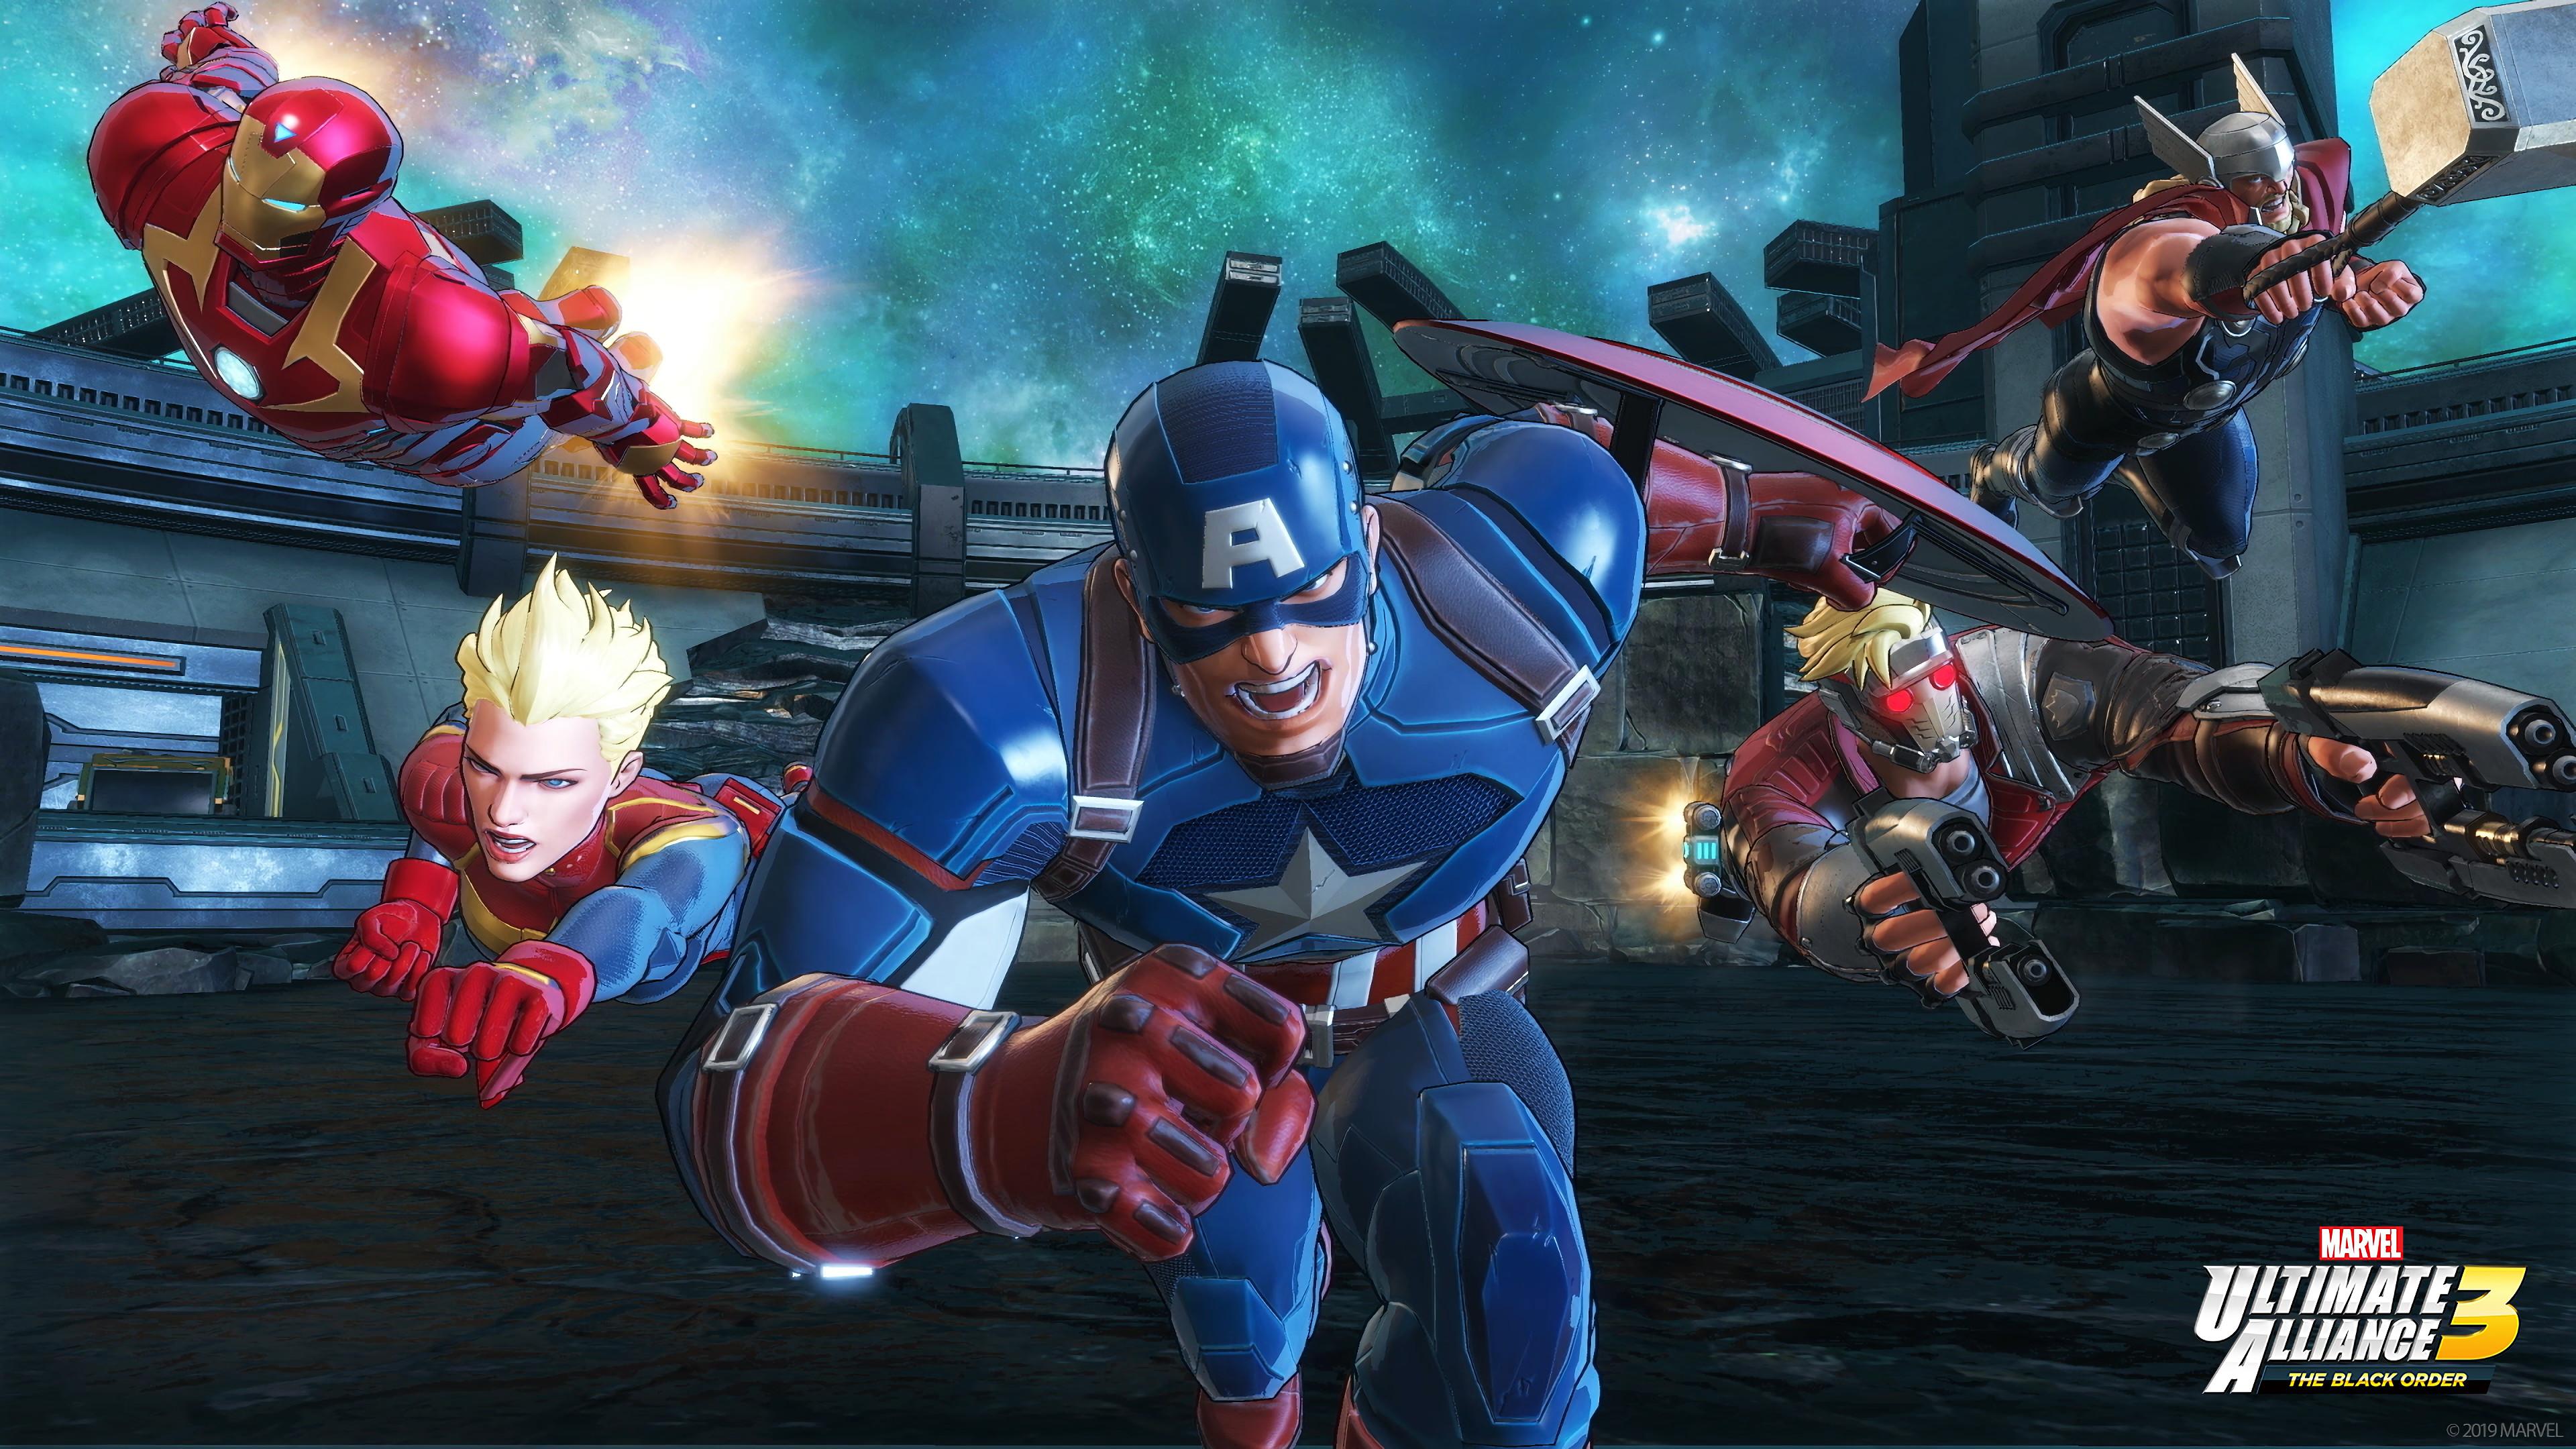 Marvel Ultimate Alliance 3 4k Ultra Hd Wallpaper Background